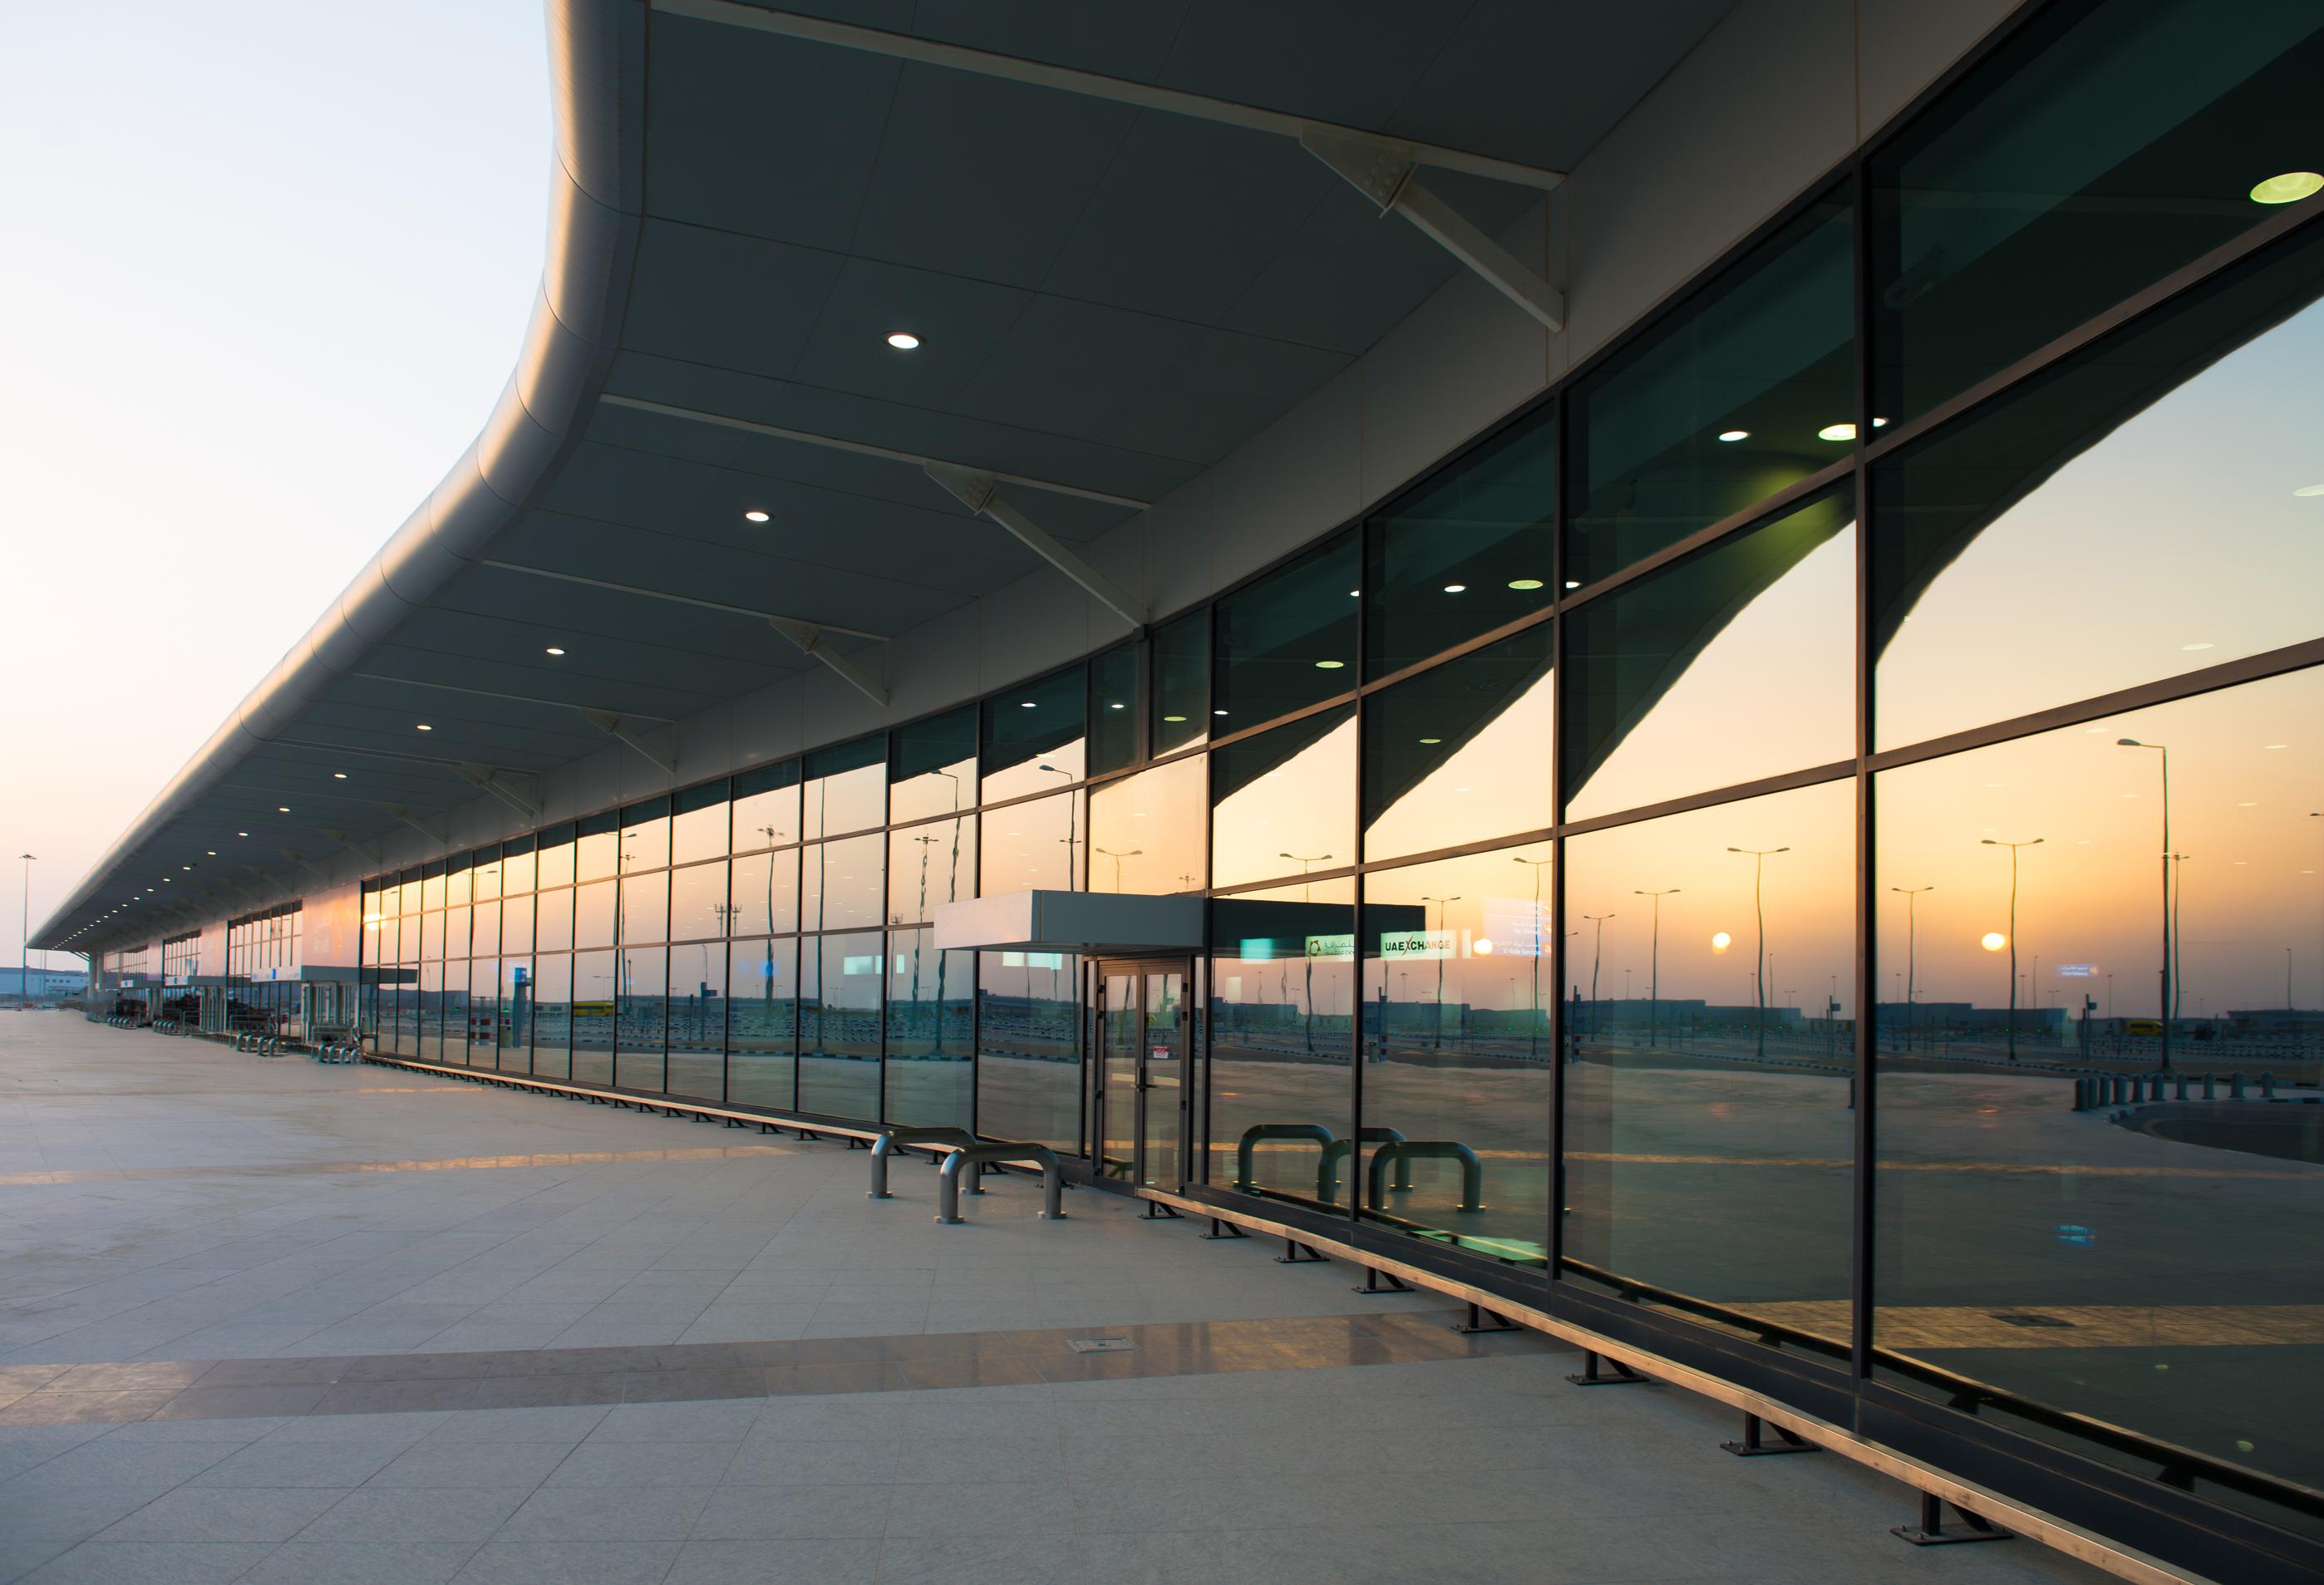 Sunset at Al Maktoum International.